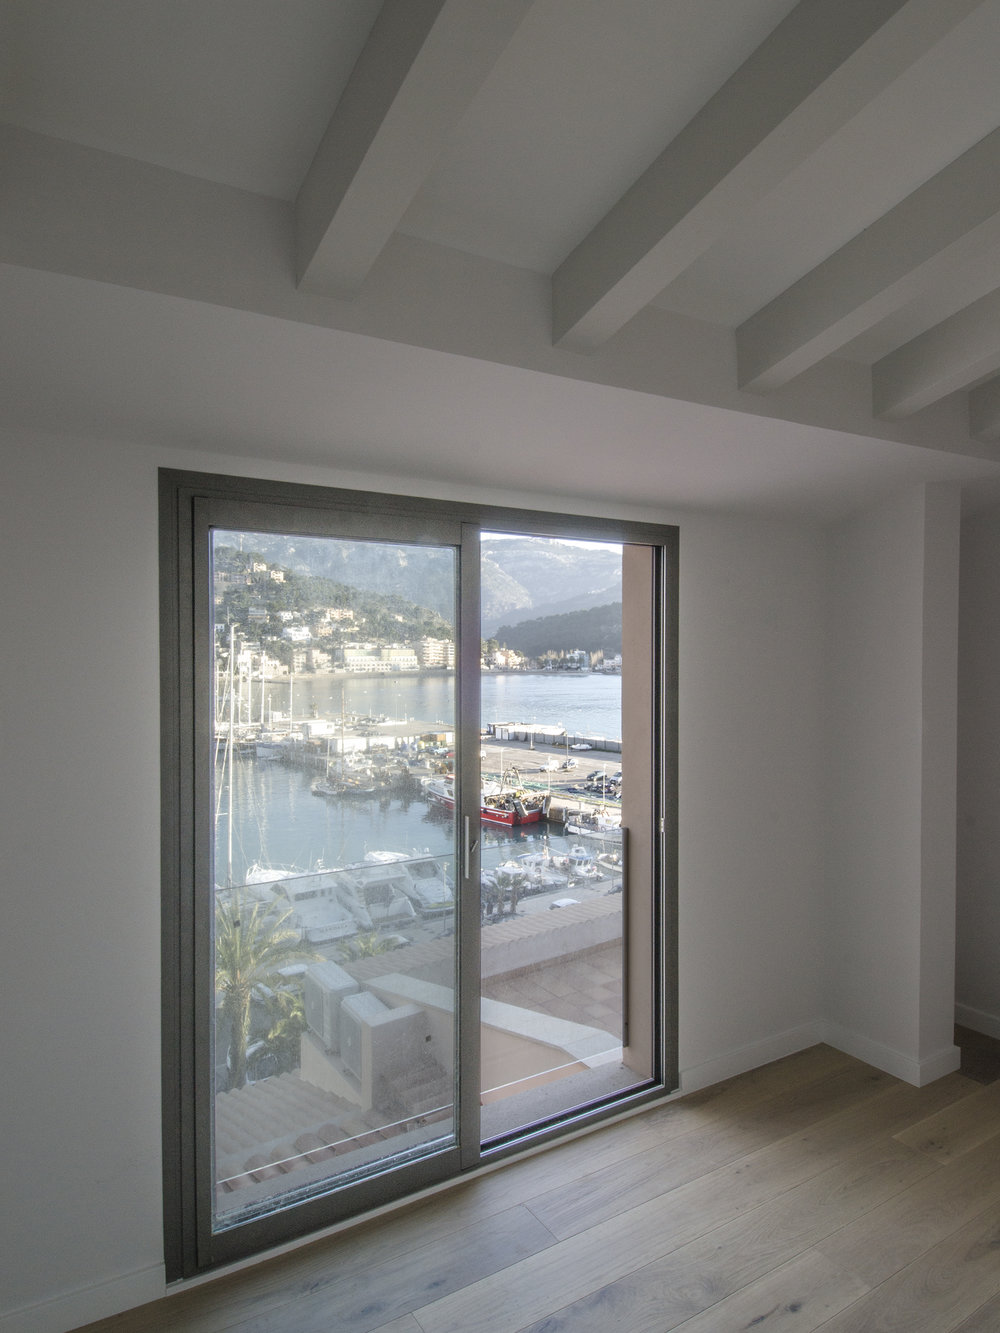 AS_INT_L_room 4th floor_3x4_2500px_72DPI.jpg